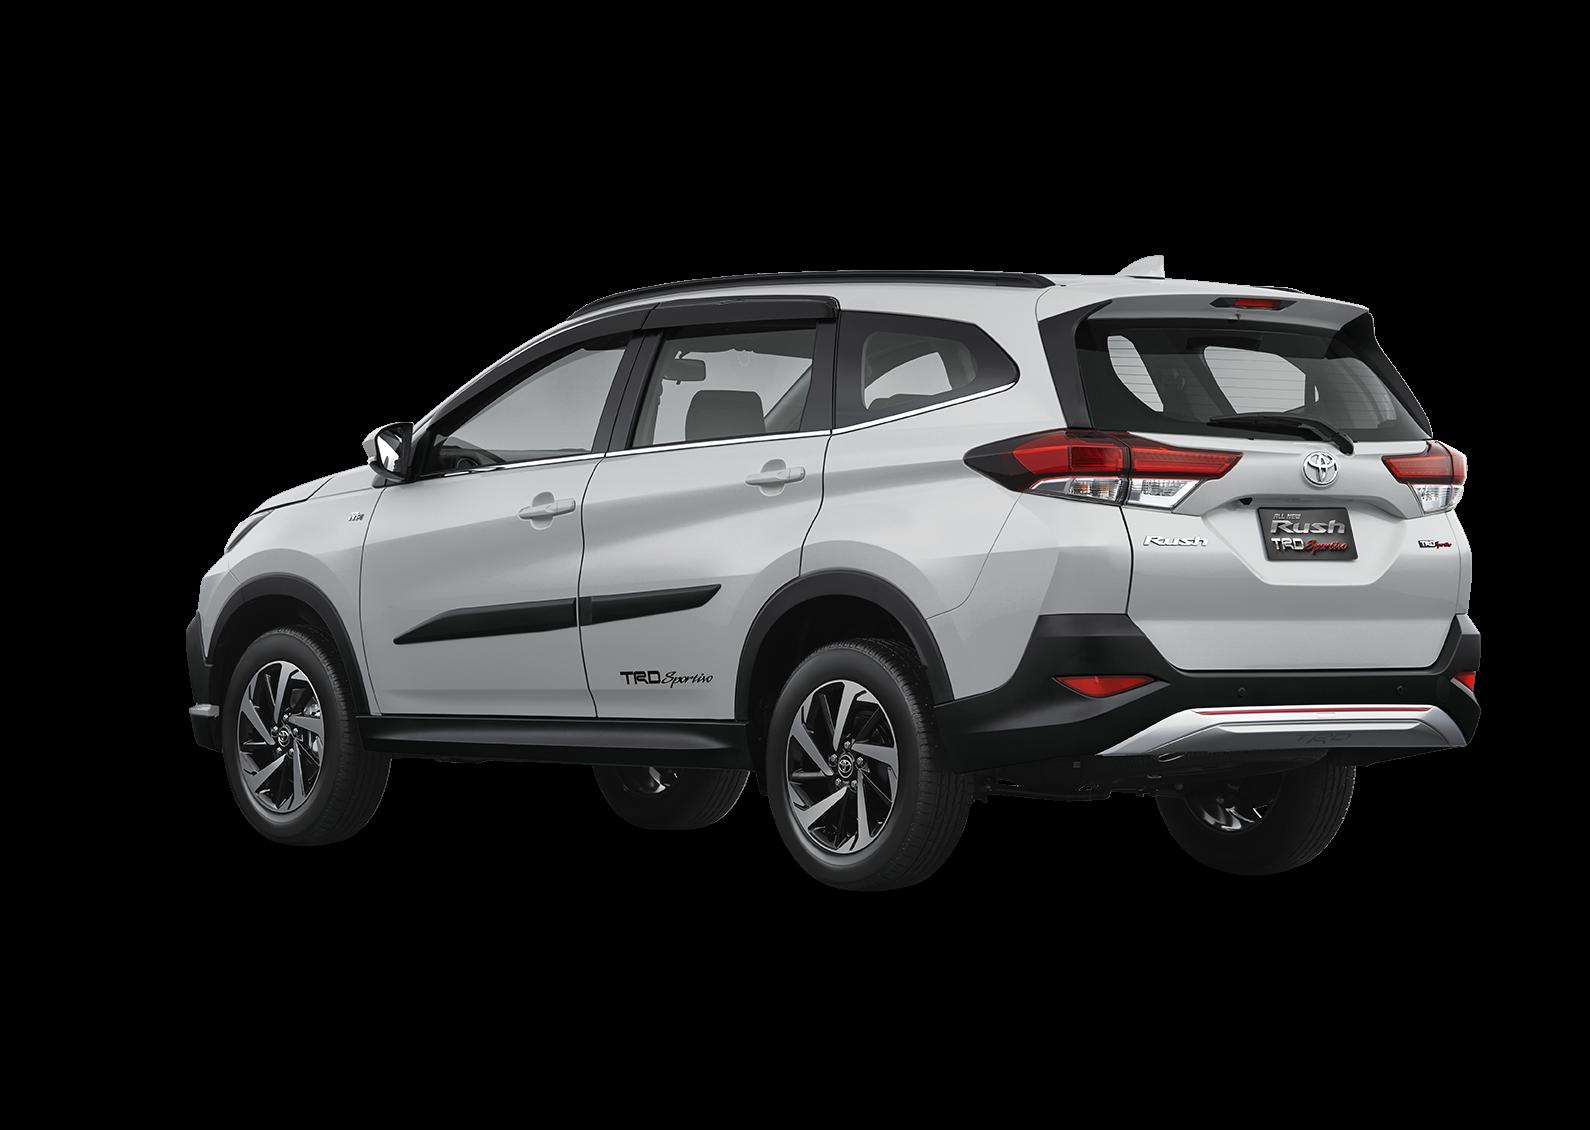 Toyota New Rush 2018 >> New 2018 Toyota Rush SUV makes debut in Indonesia Paul Tan - Image 742833